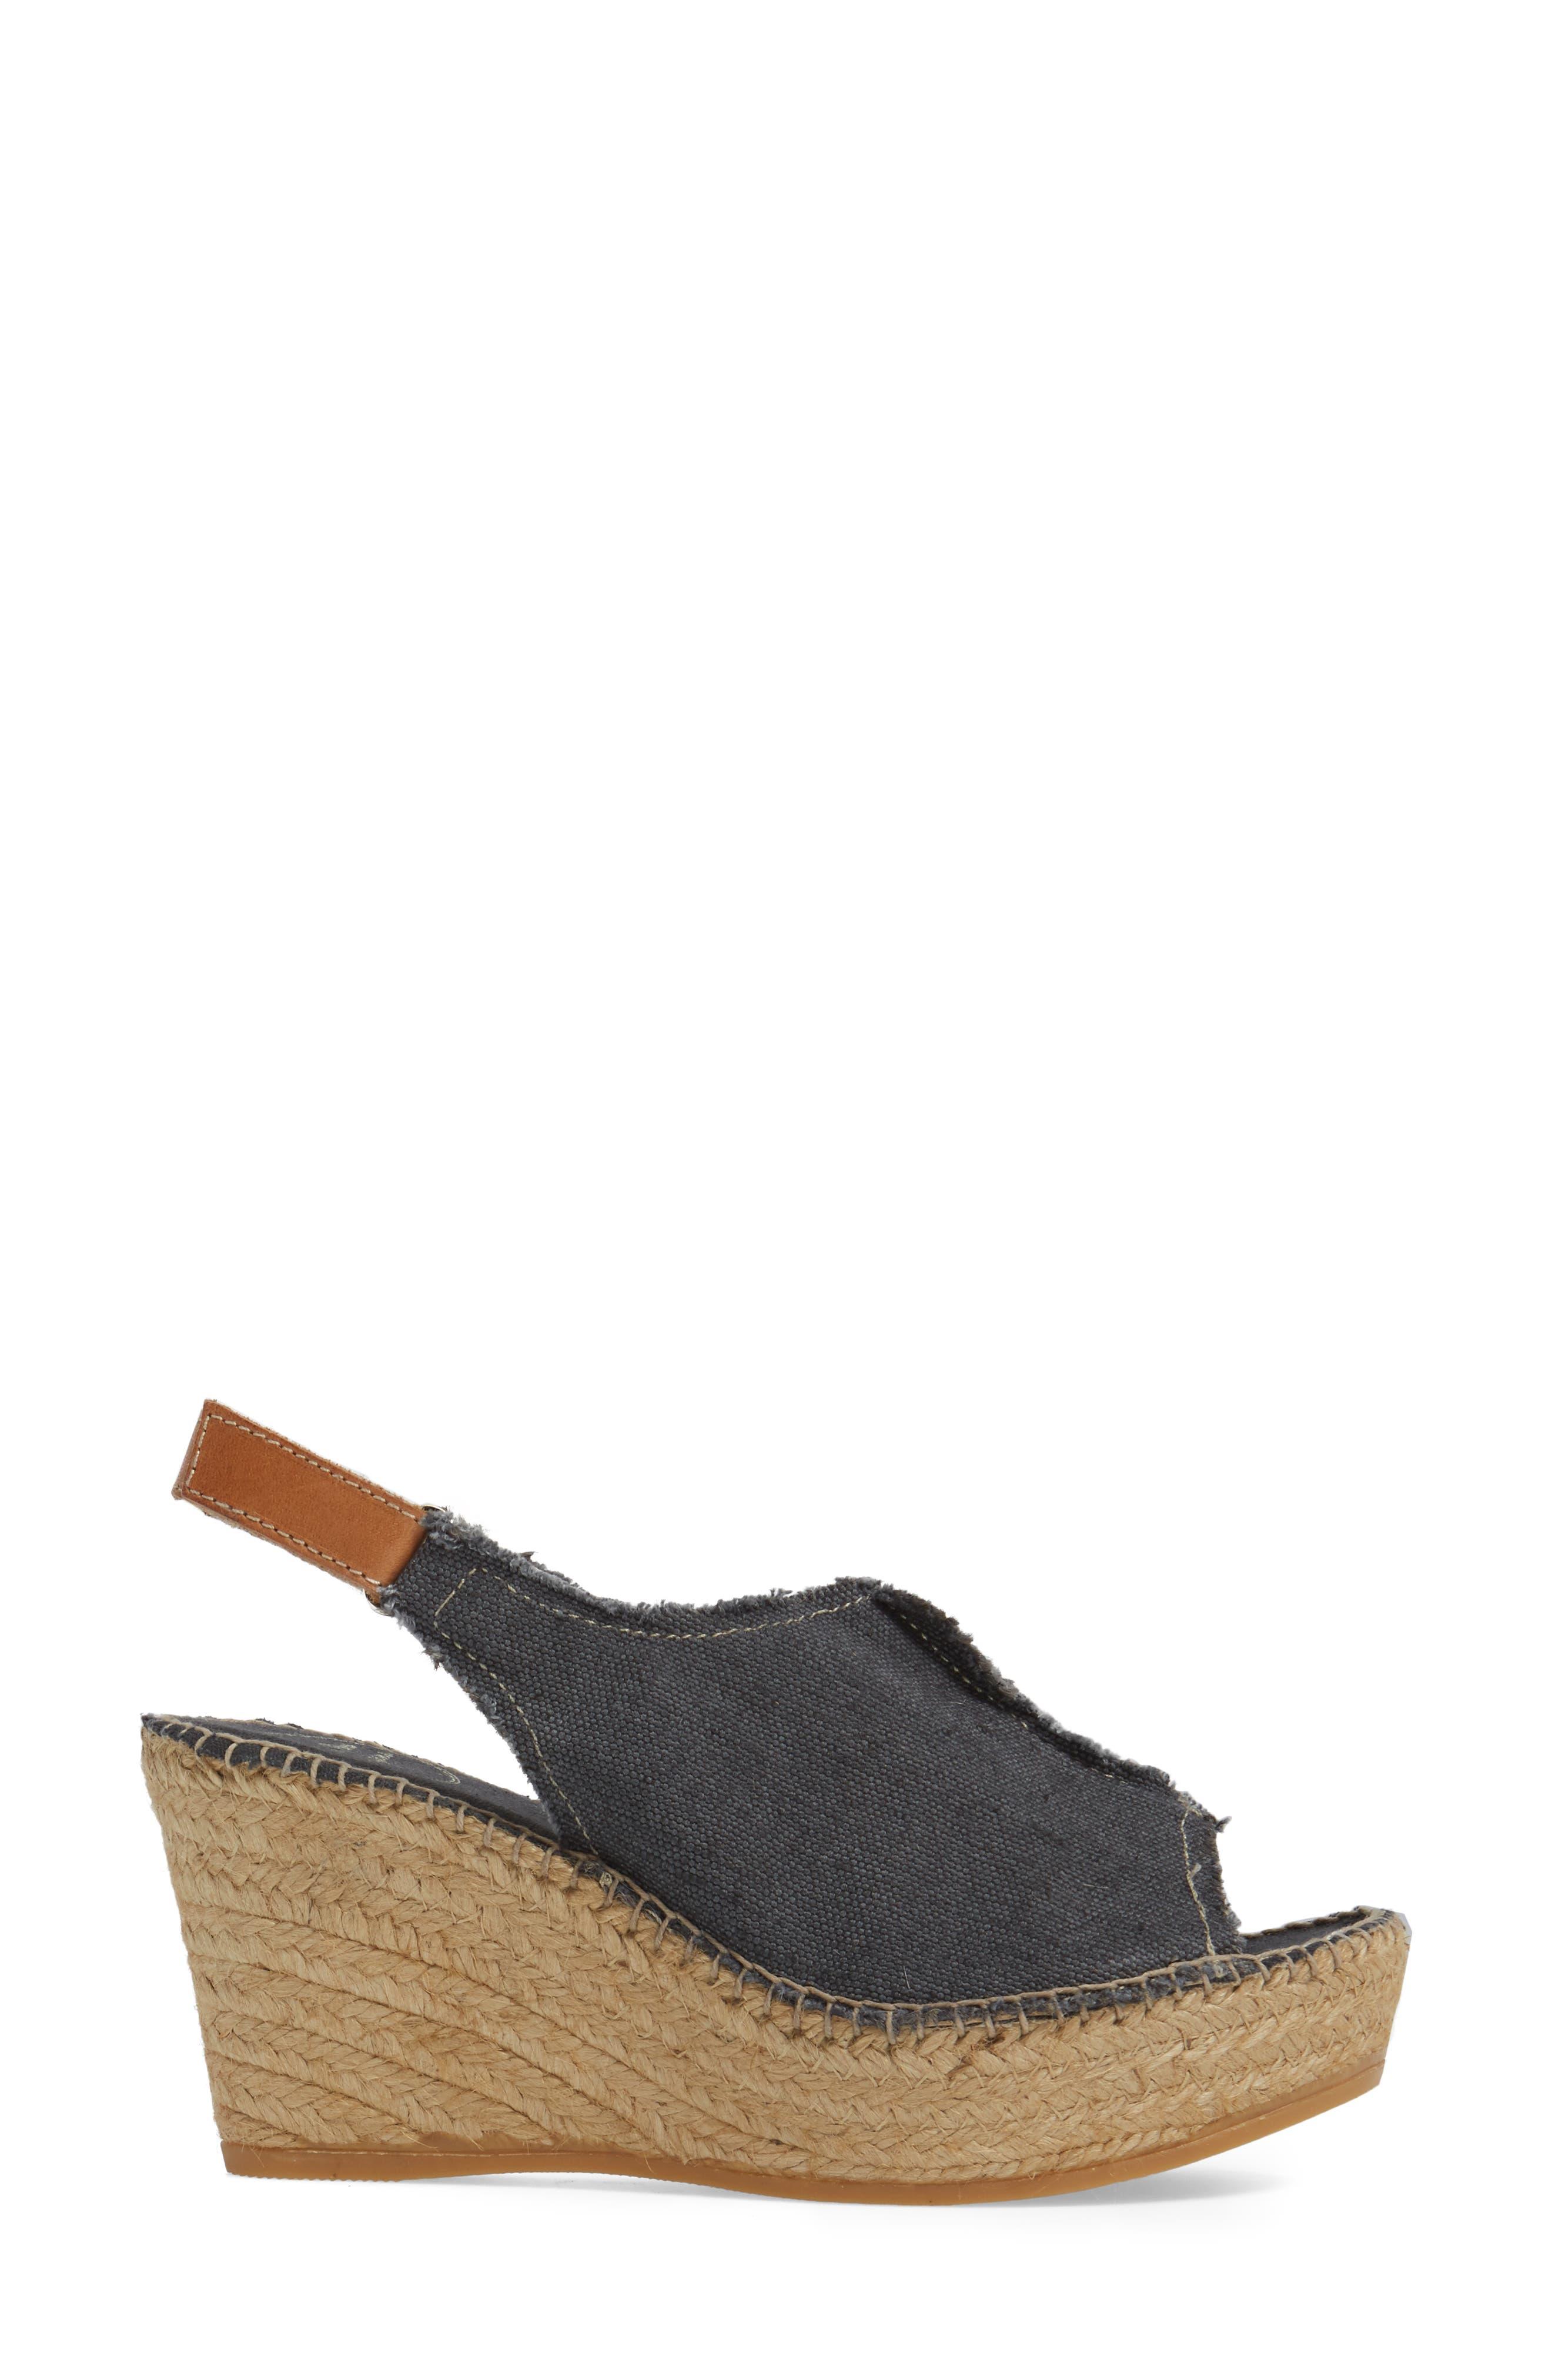 TONI PONS, 'Lugano' Espadrille Wedge Sandal, Alternate thumbnail 3, color, BLACK FABRIC